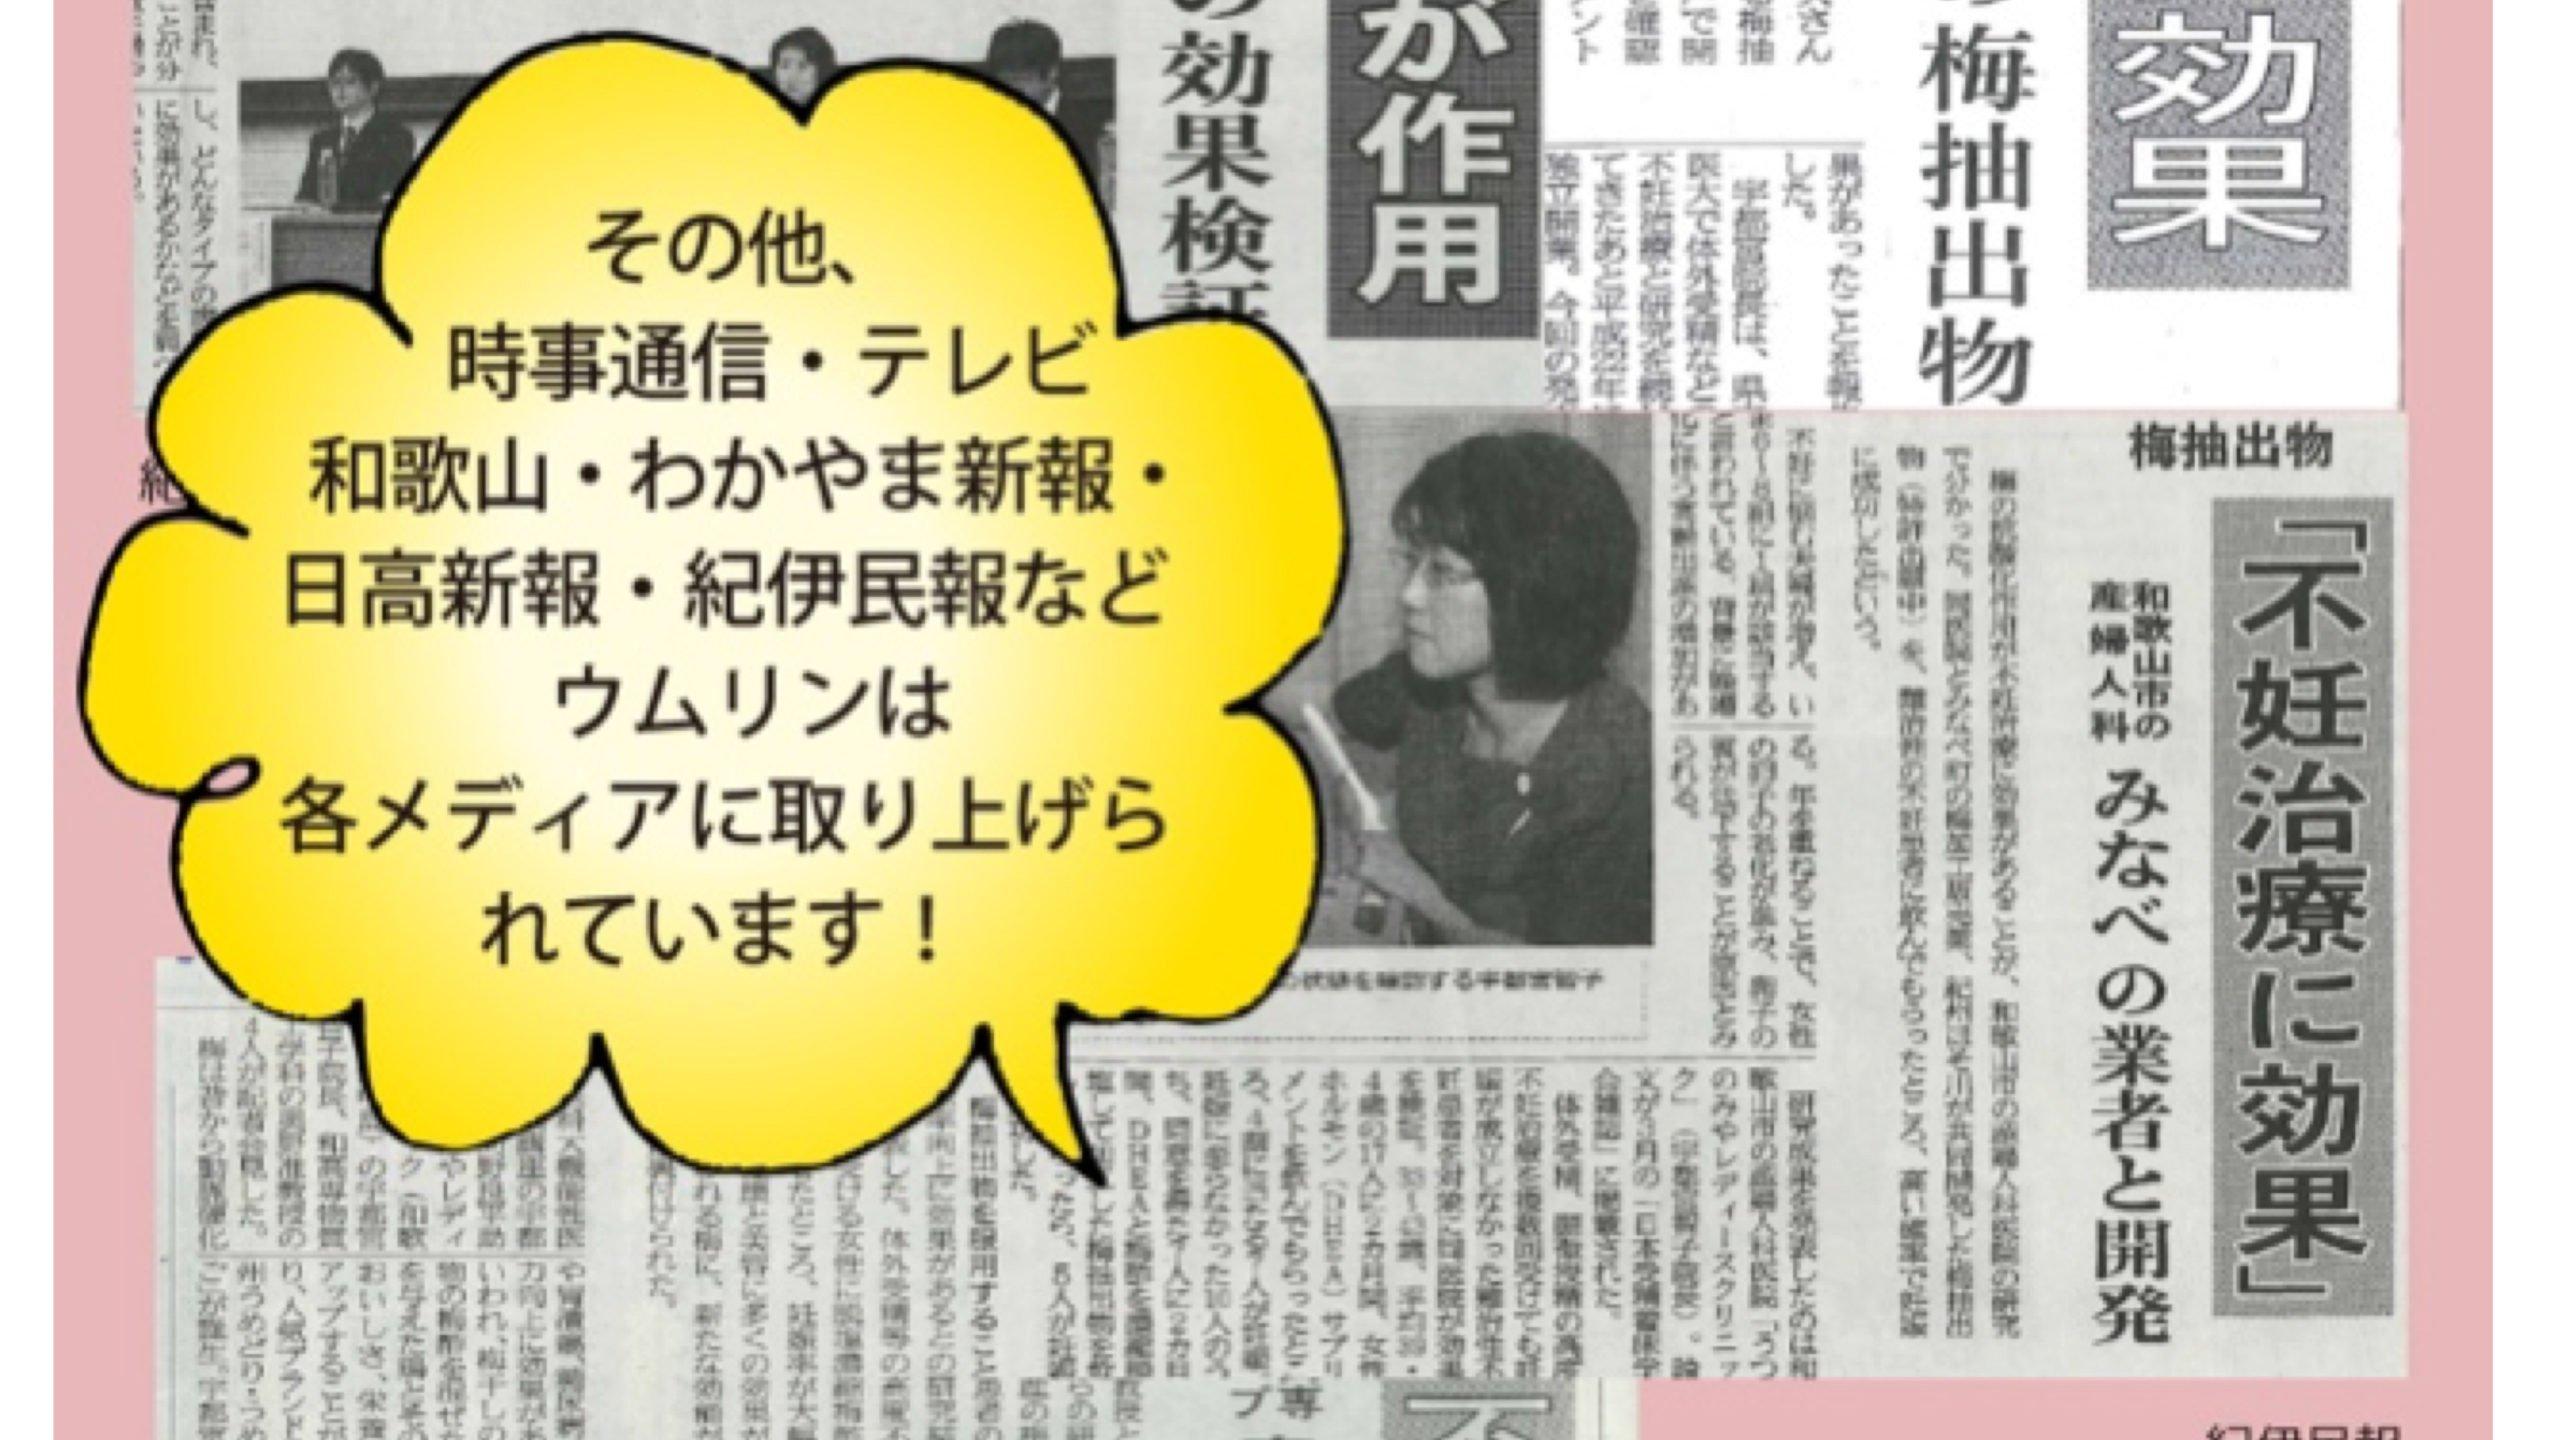 NHKなどメディアや国も注目するウムリンの実力!